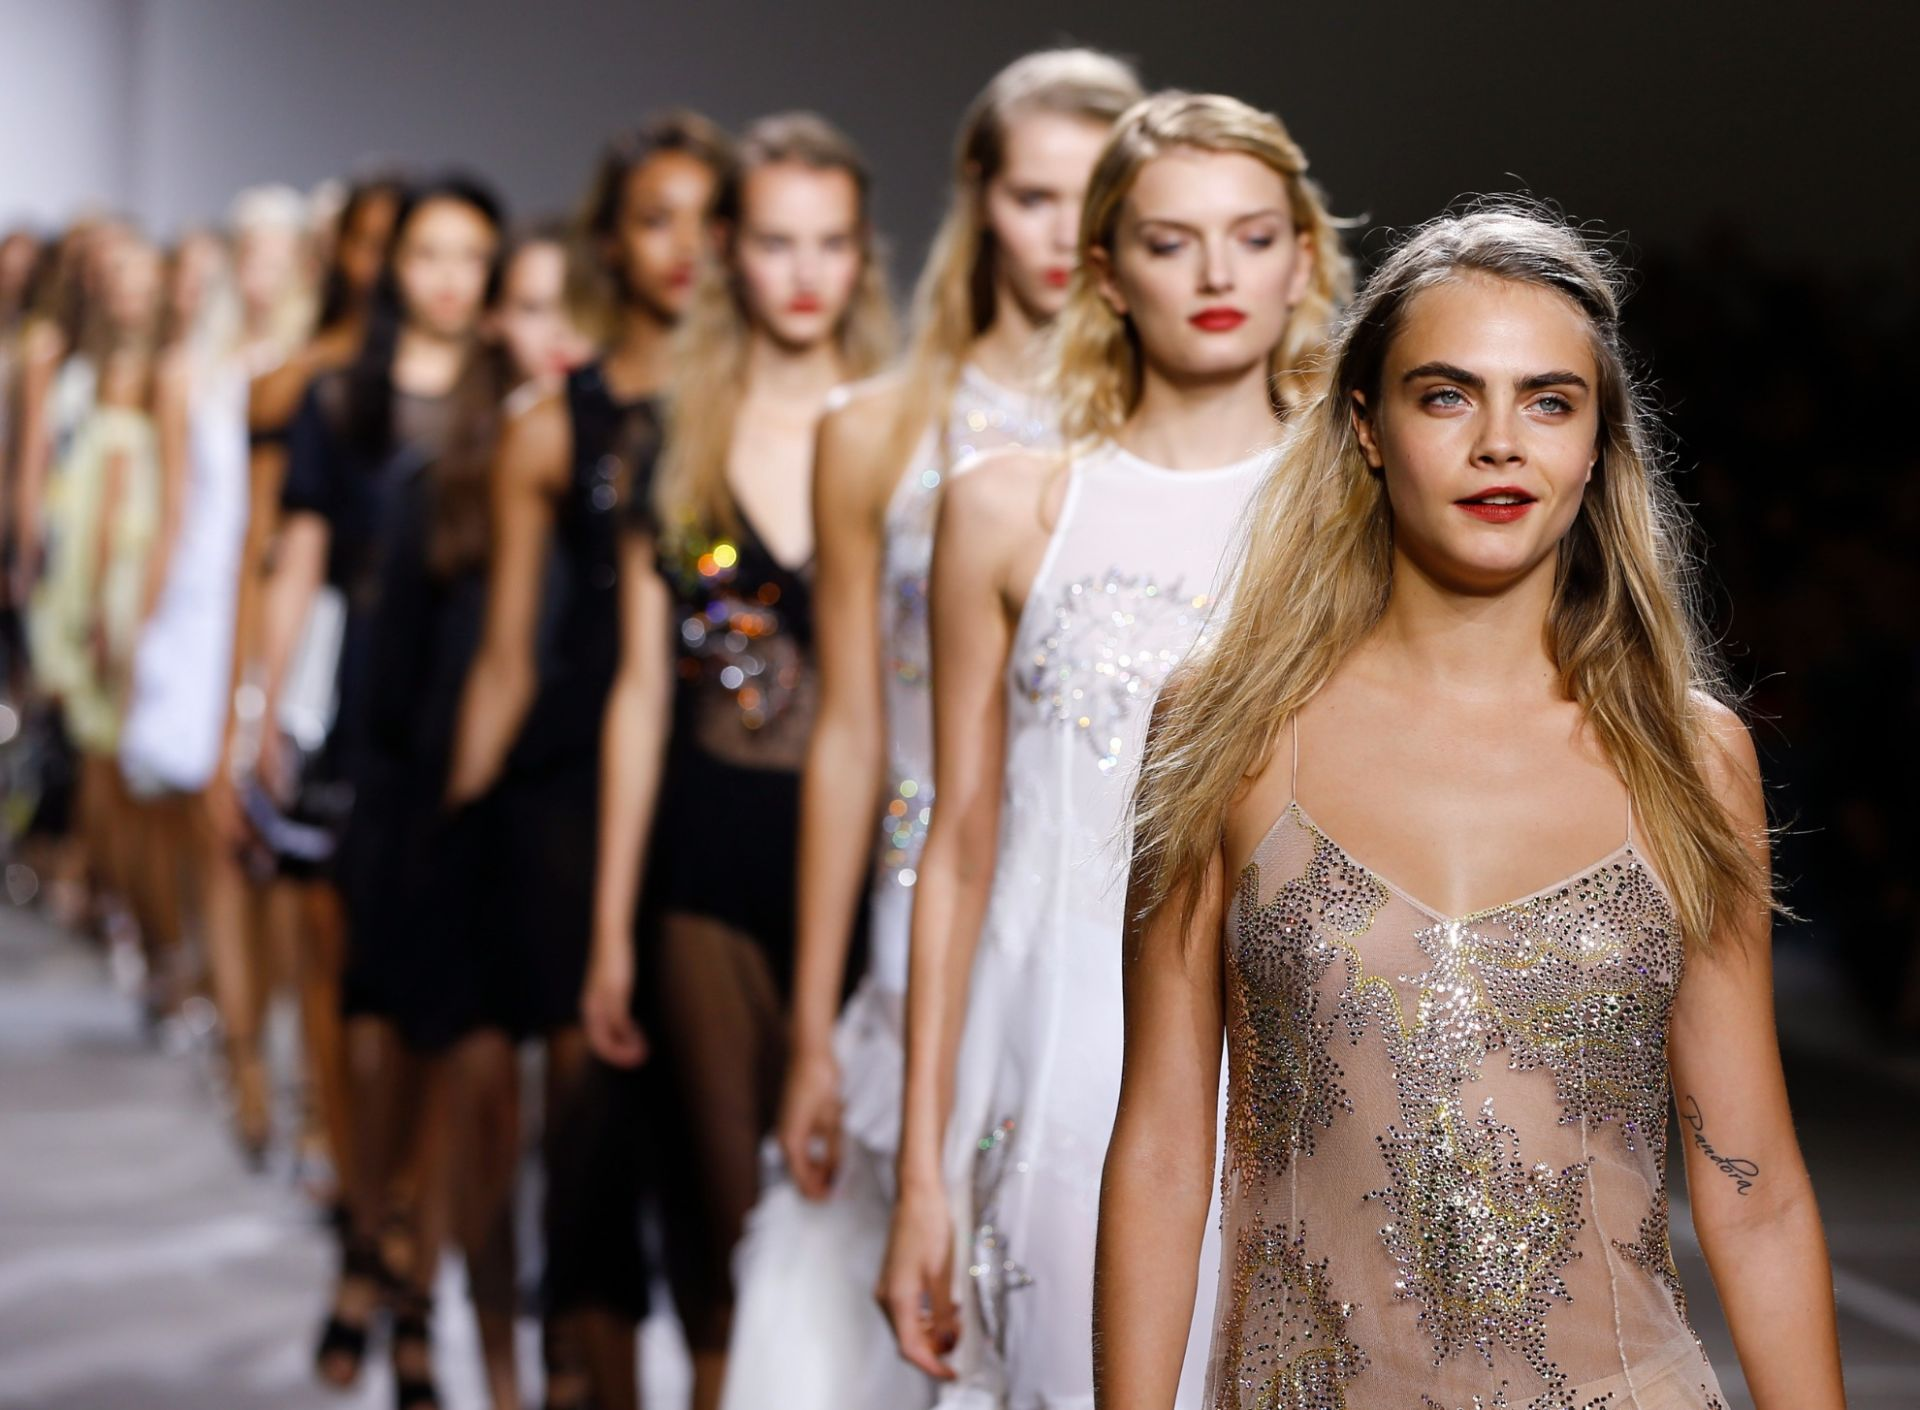 2019 Milan Fashion Week 19th February - 25 February